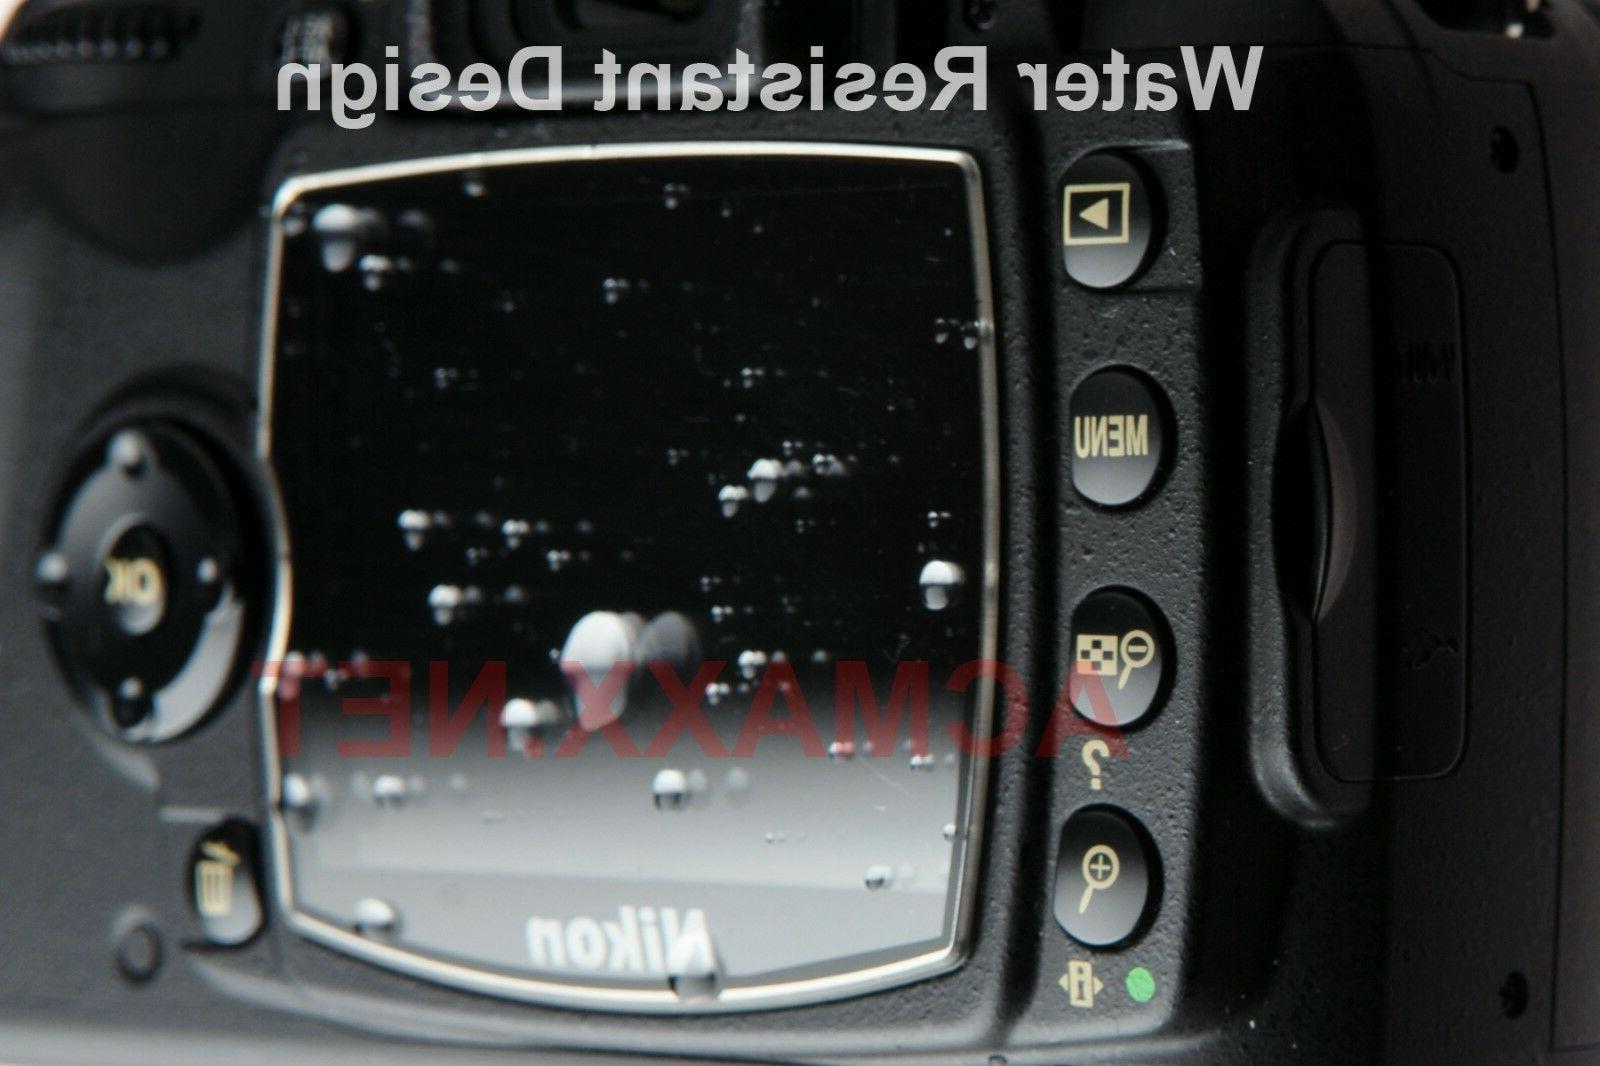 ACMAXX LCD SCREEN PROTECTOR Nikon D5300 DSLR